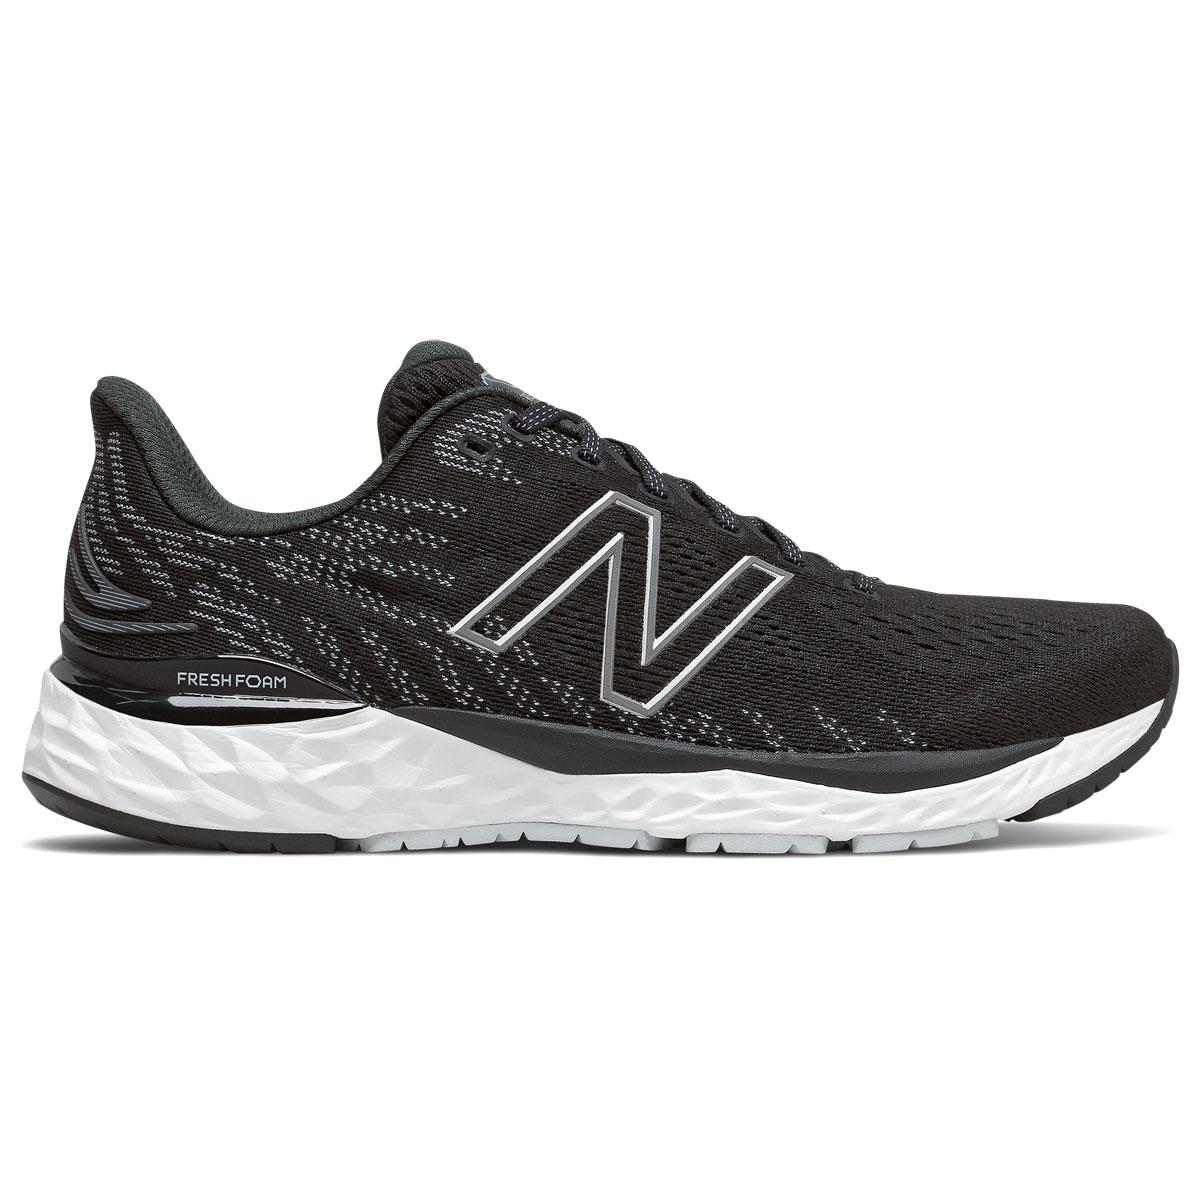 Men's New Balance Fresh Foam 880v11 Running Shoe - Color: Black/Cyclone - Size: 6 - Width: Wide, Black/Cyclone, large, image 1